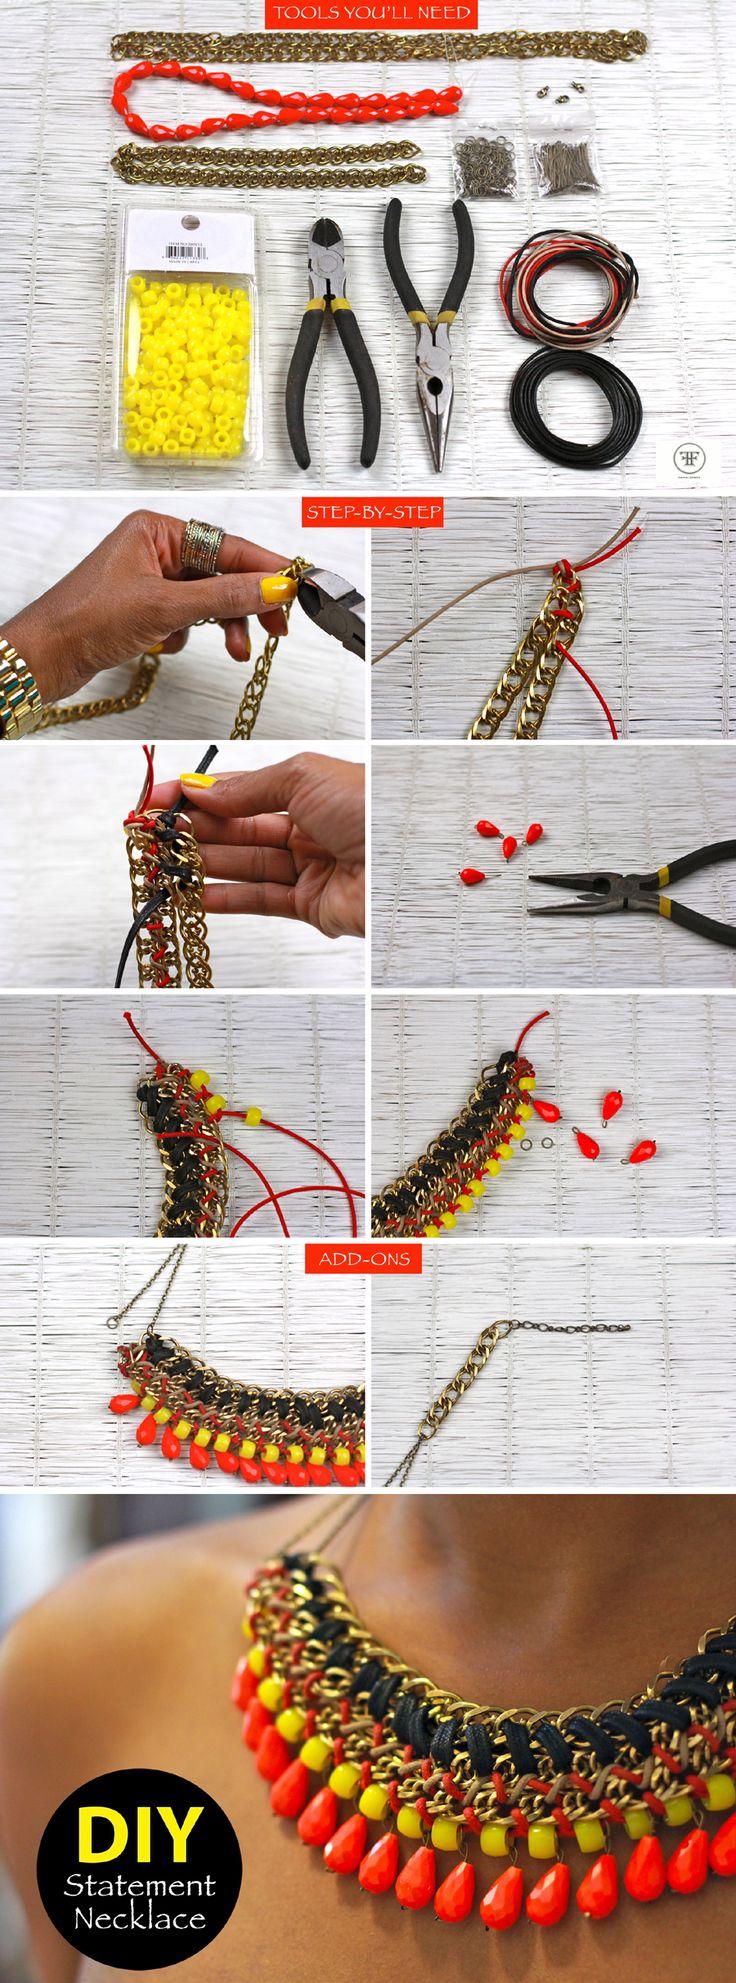 jewellery - statement necklace diy